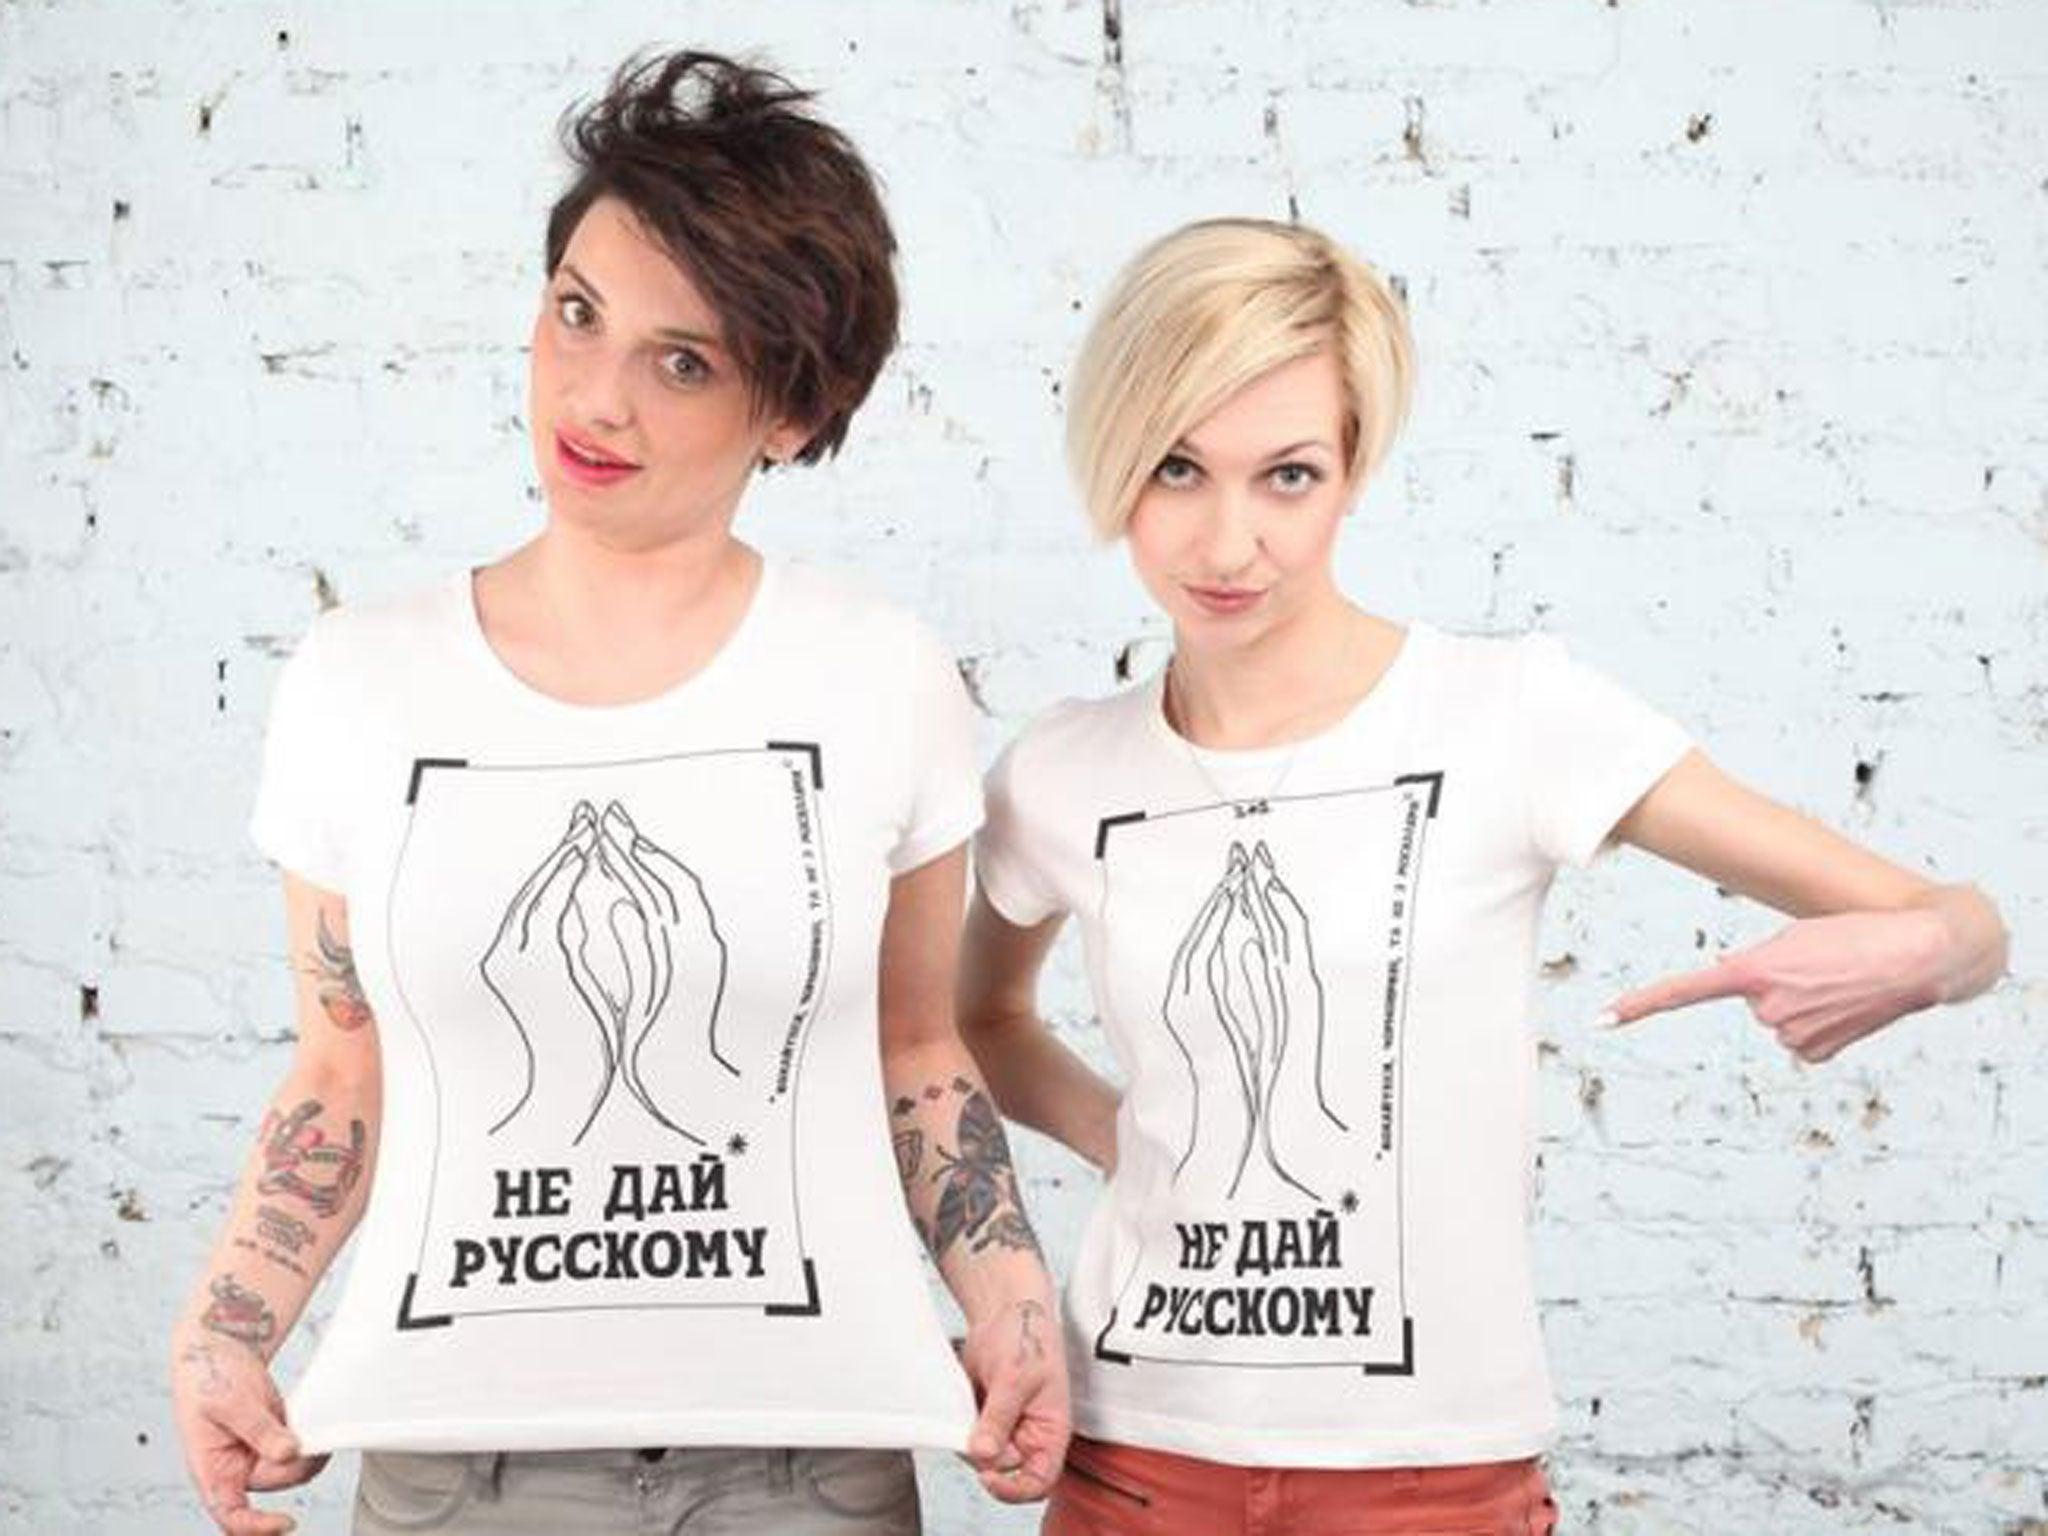 Секс девочки украинки 4 фотография